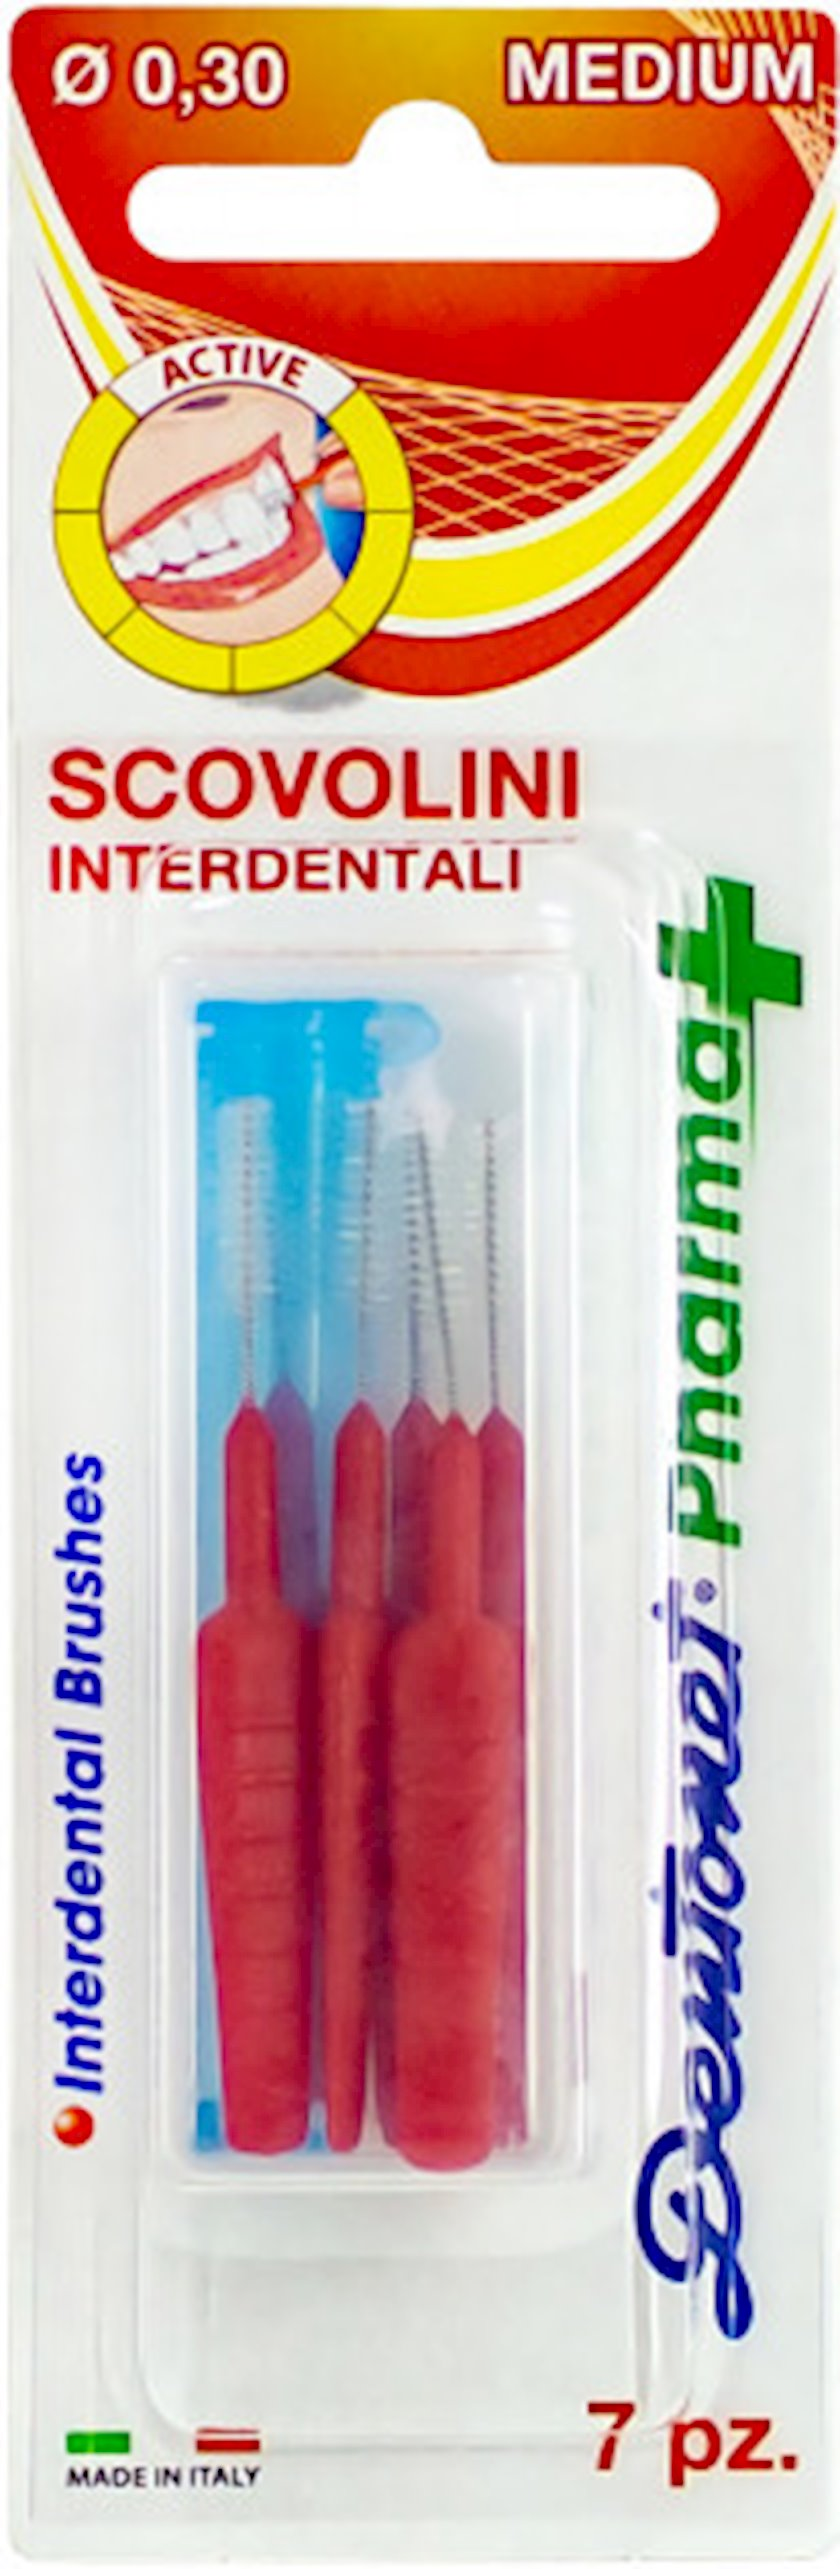 Dişarası fırçalar Silver Care Dentonet Pharma Medium 7 əd/0.30 mm